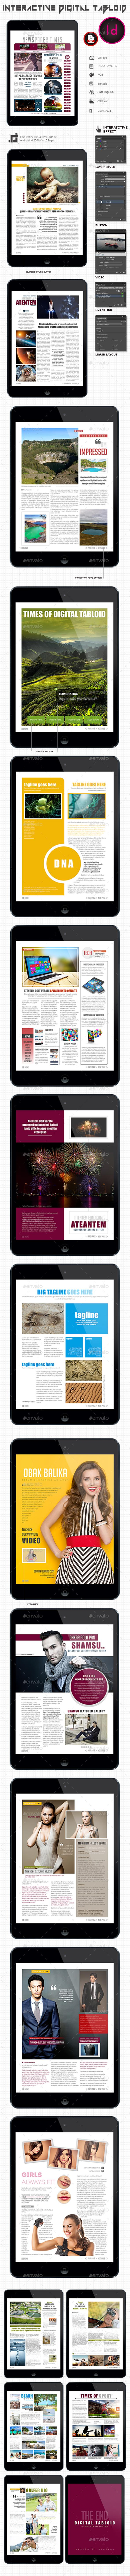 Interactive Digital Tabloid - ePublishing